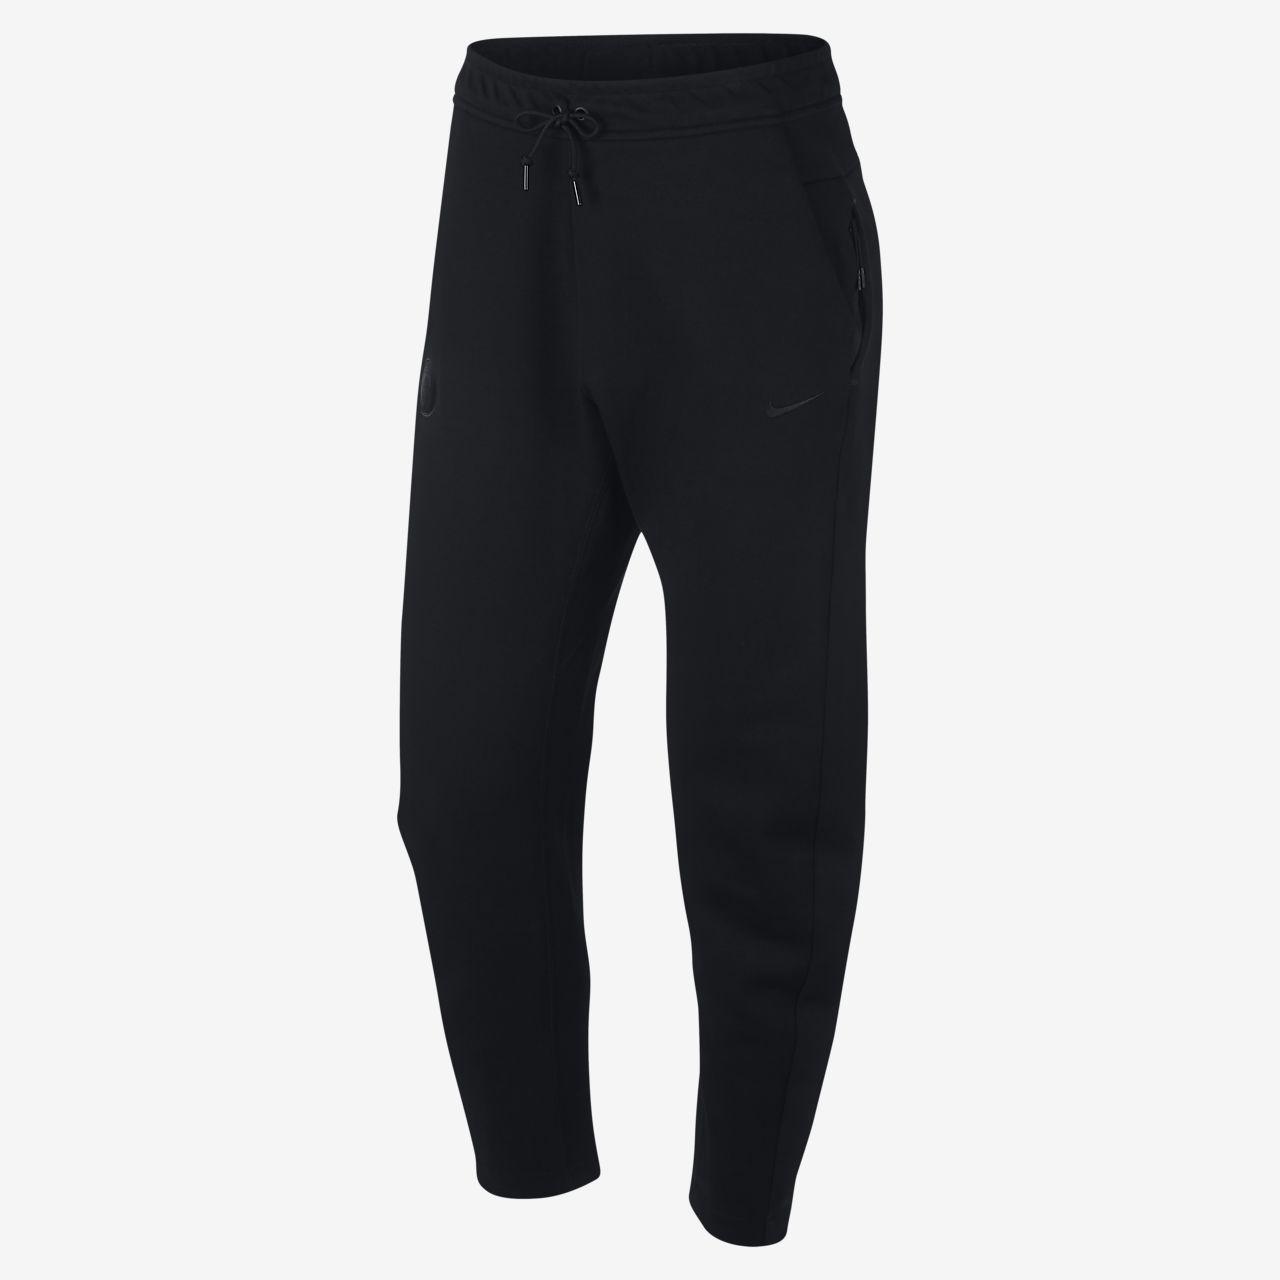 Pantaloni Manchester City FC Tech Fleece - Uomo